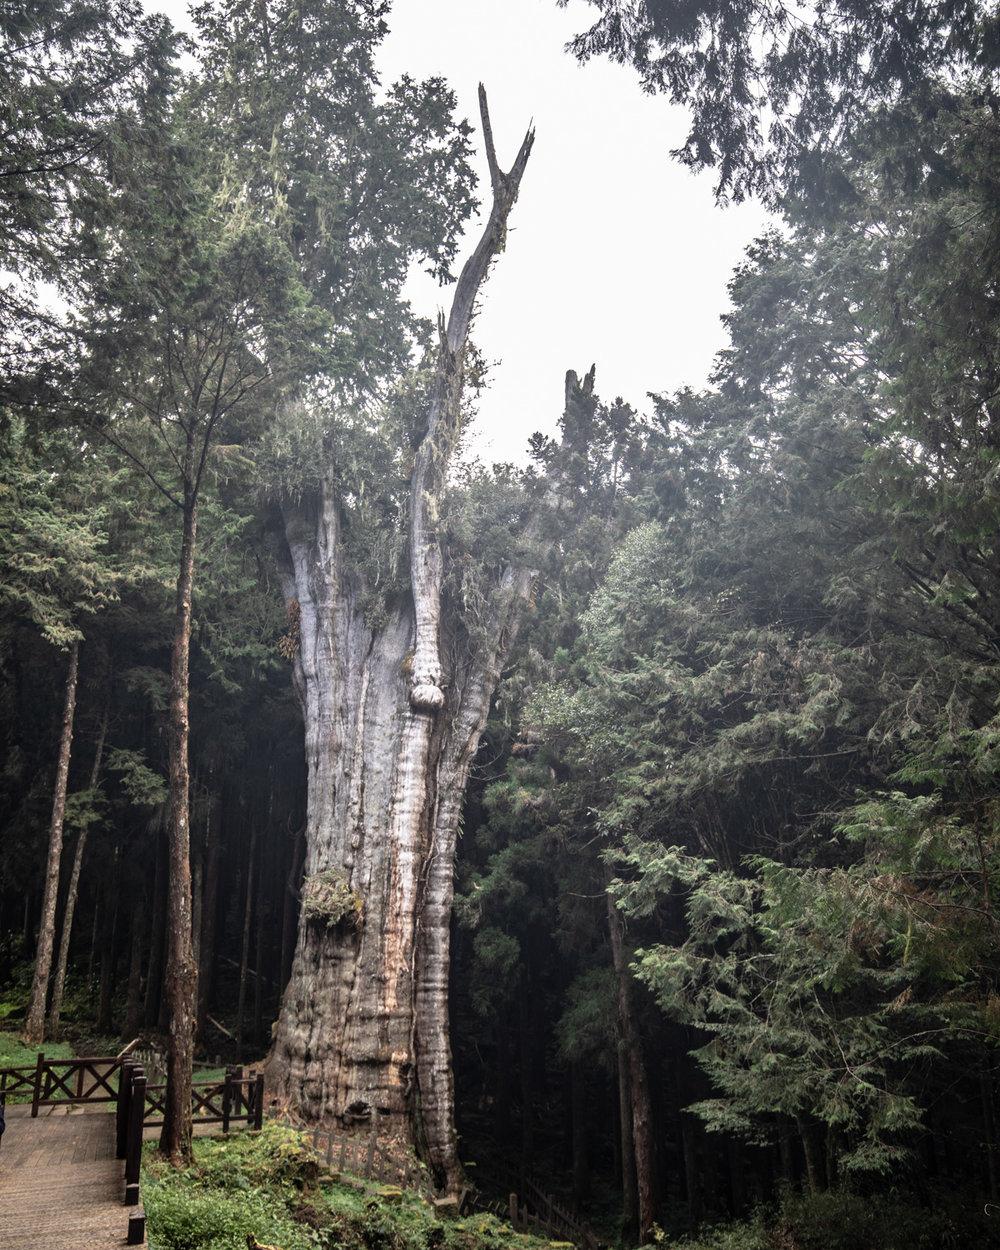 The Shuishan Giant Tree